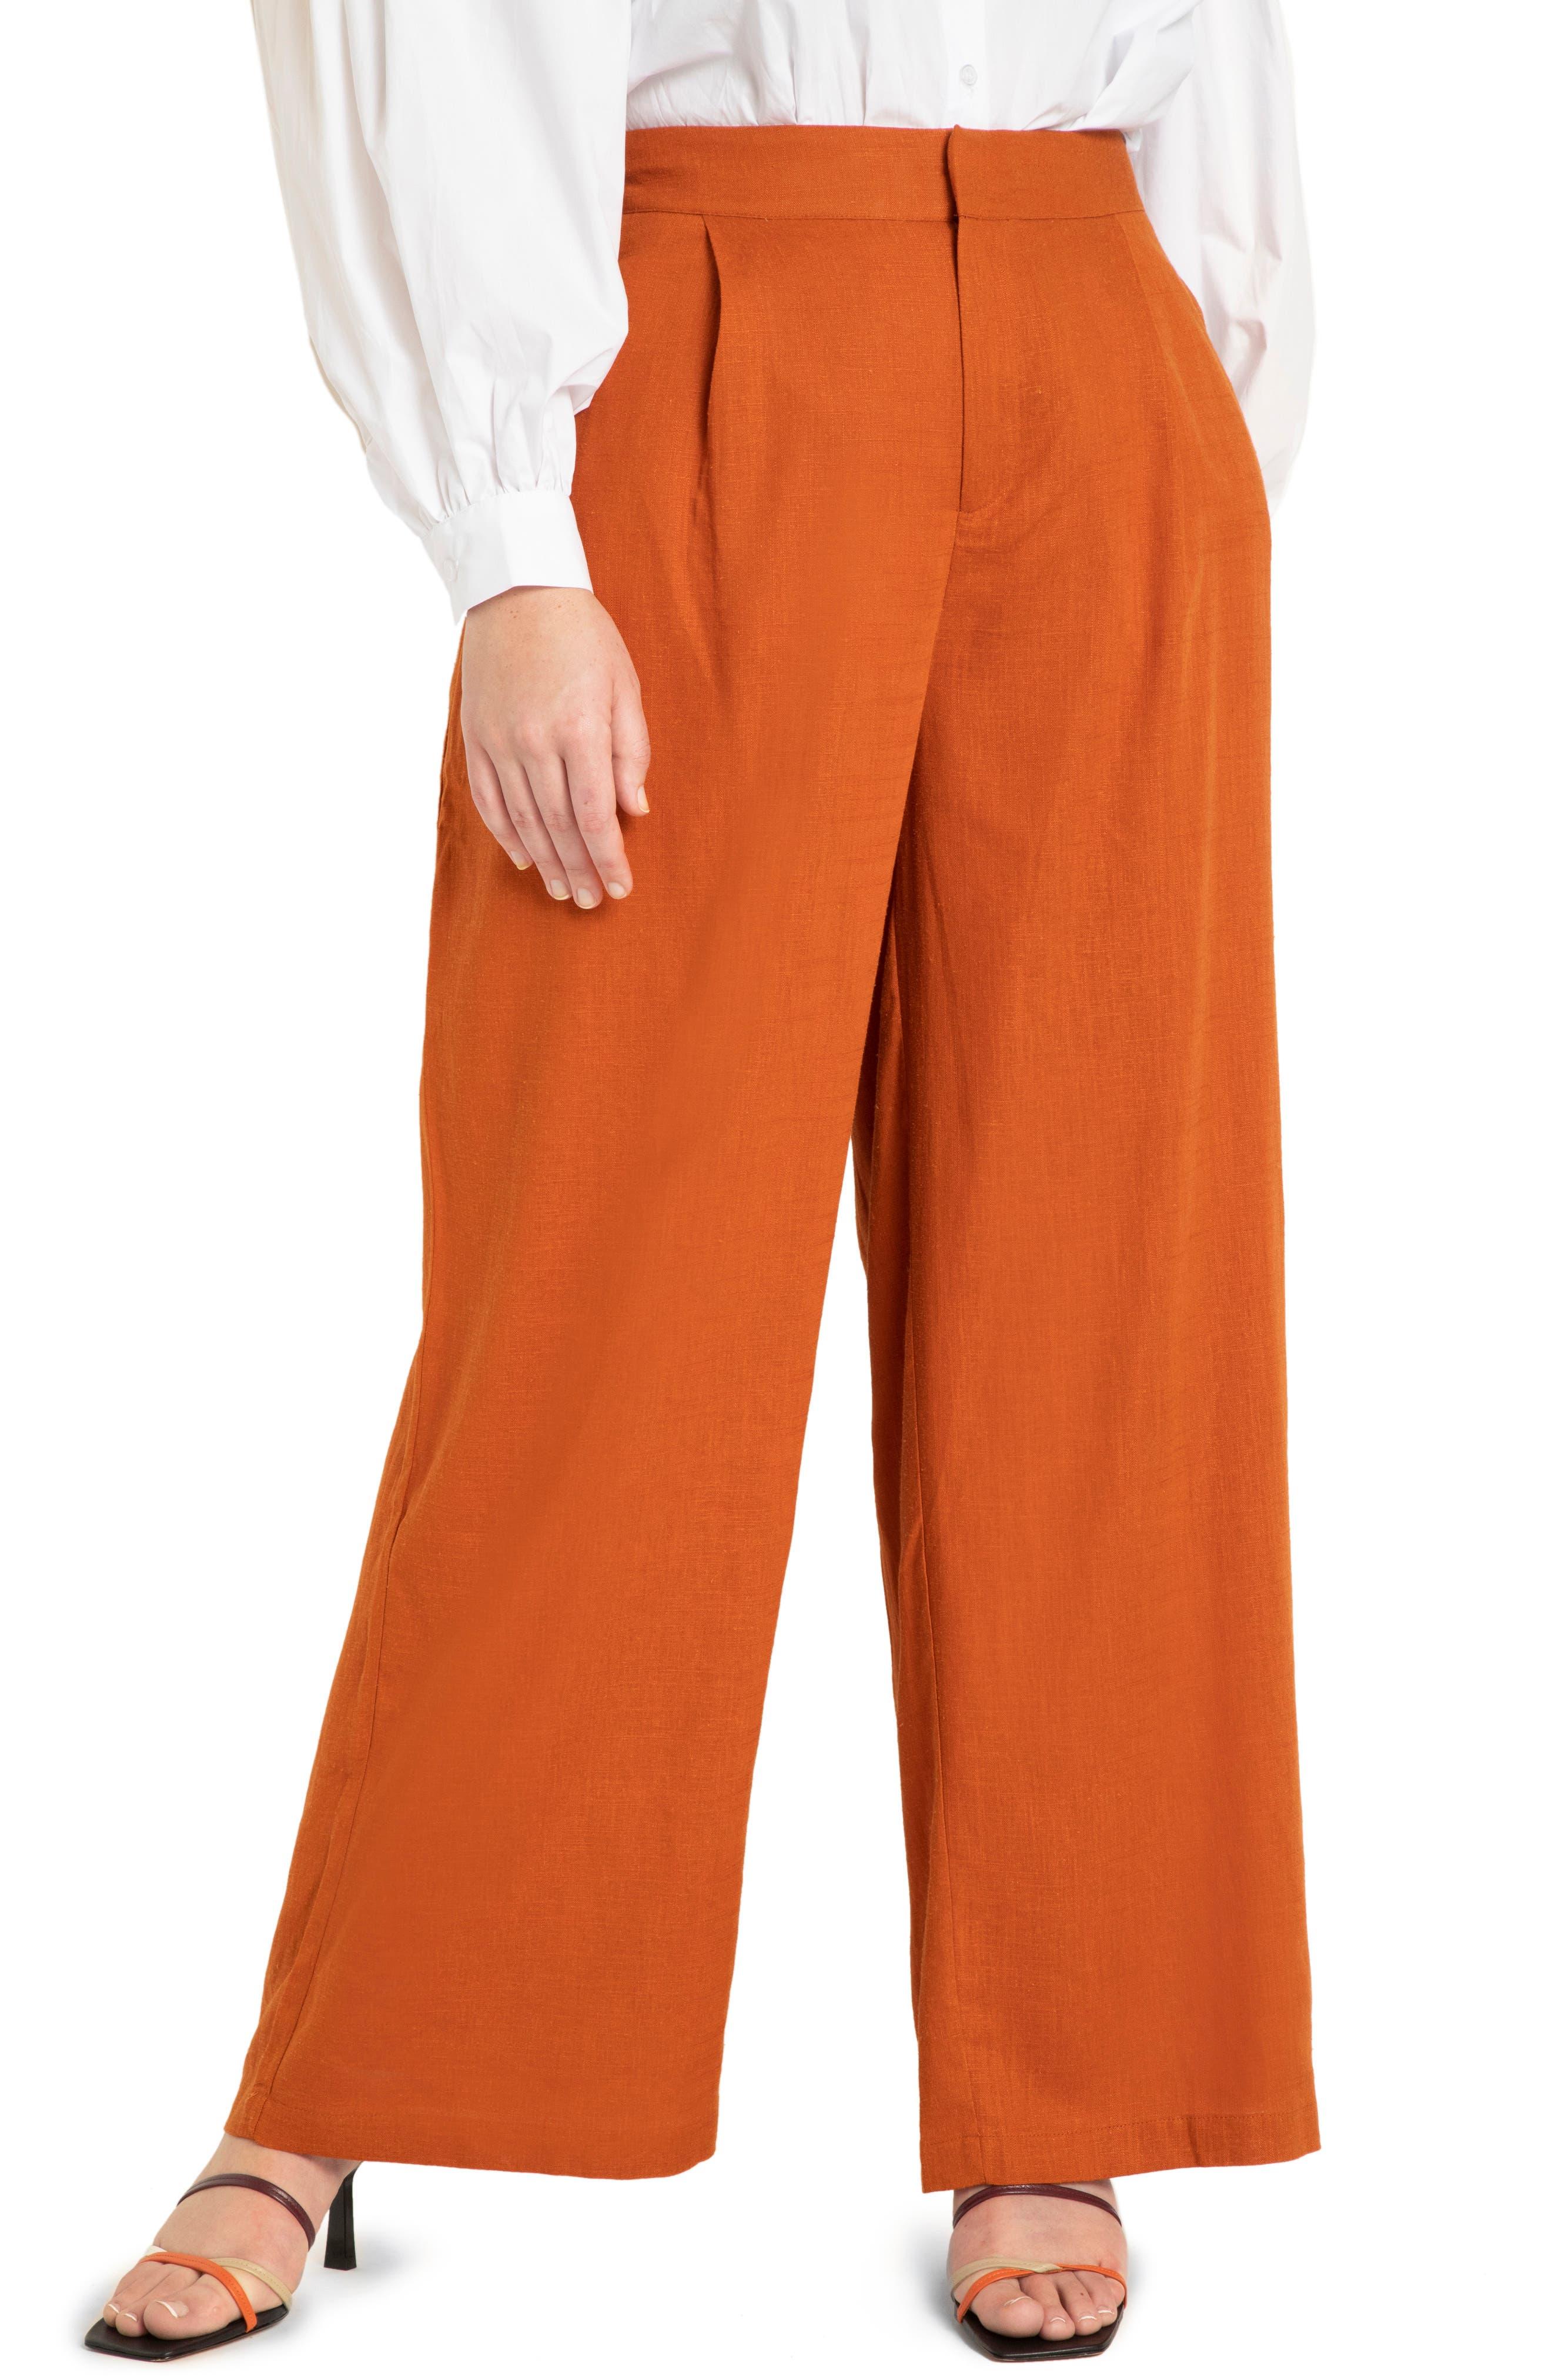 Plus Women's ELOQUII Wide-Leg Pants